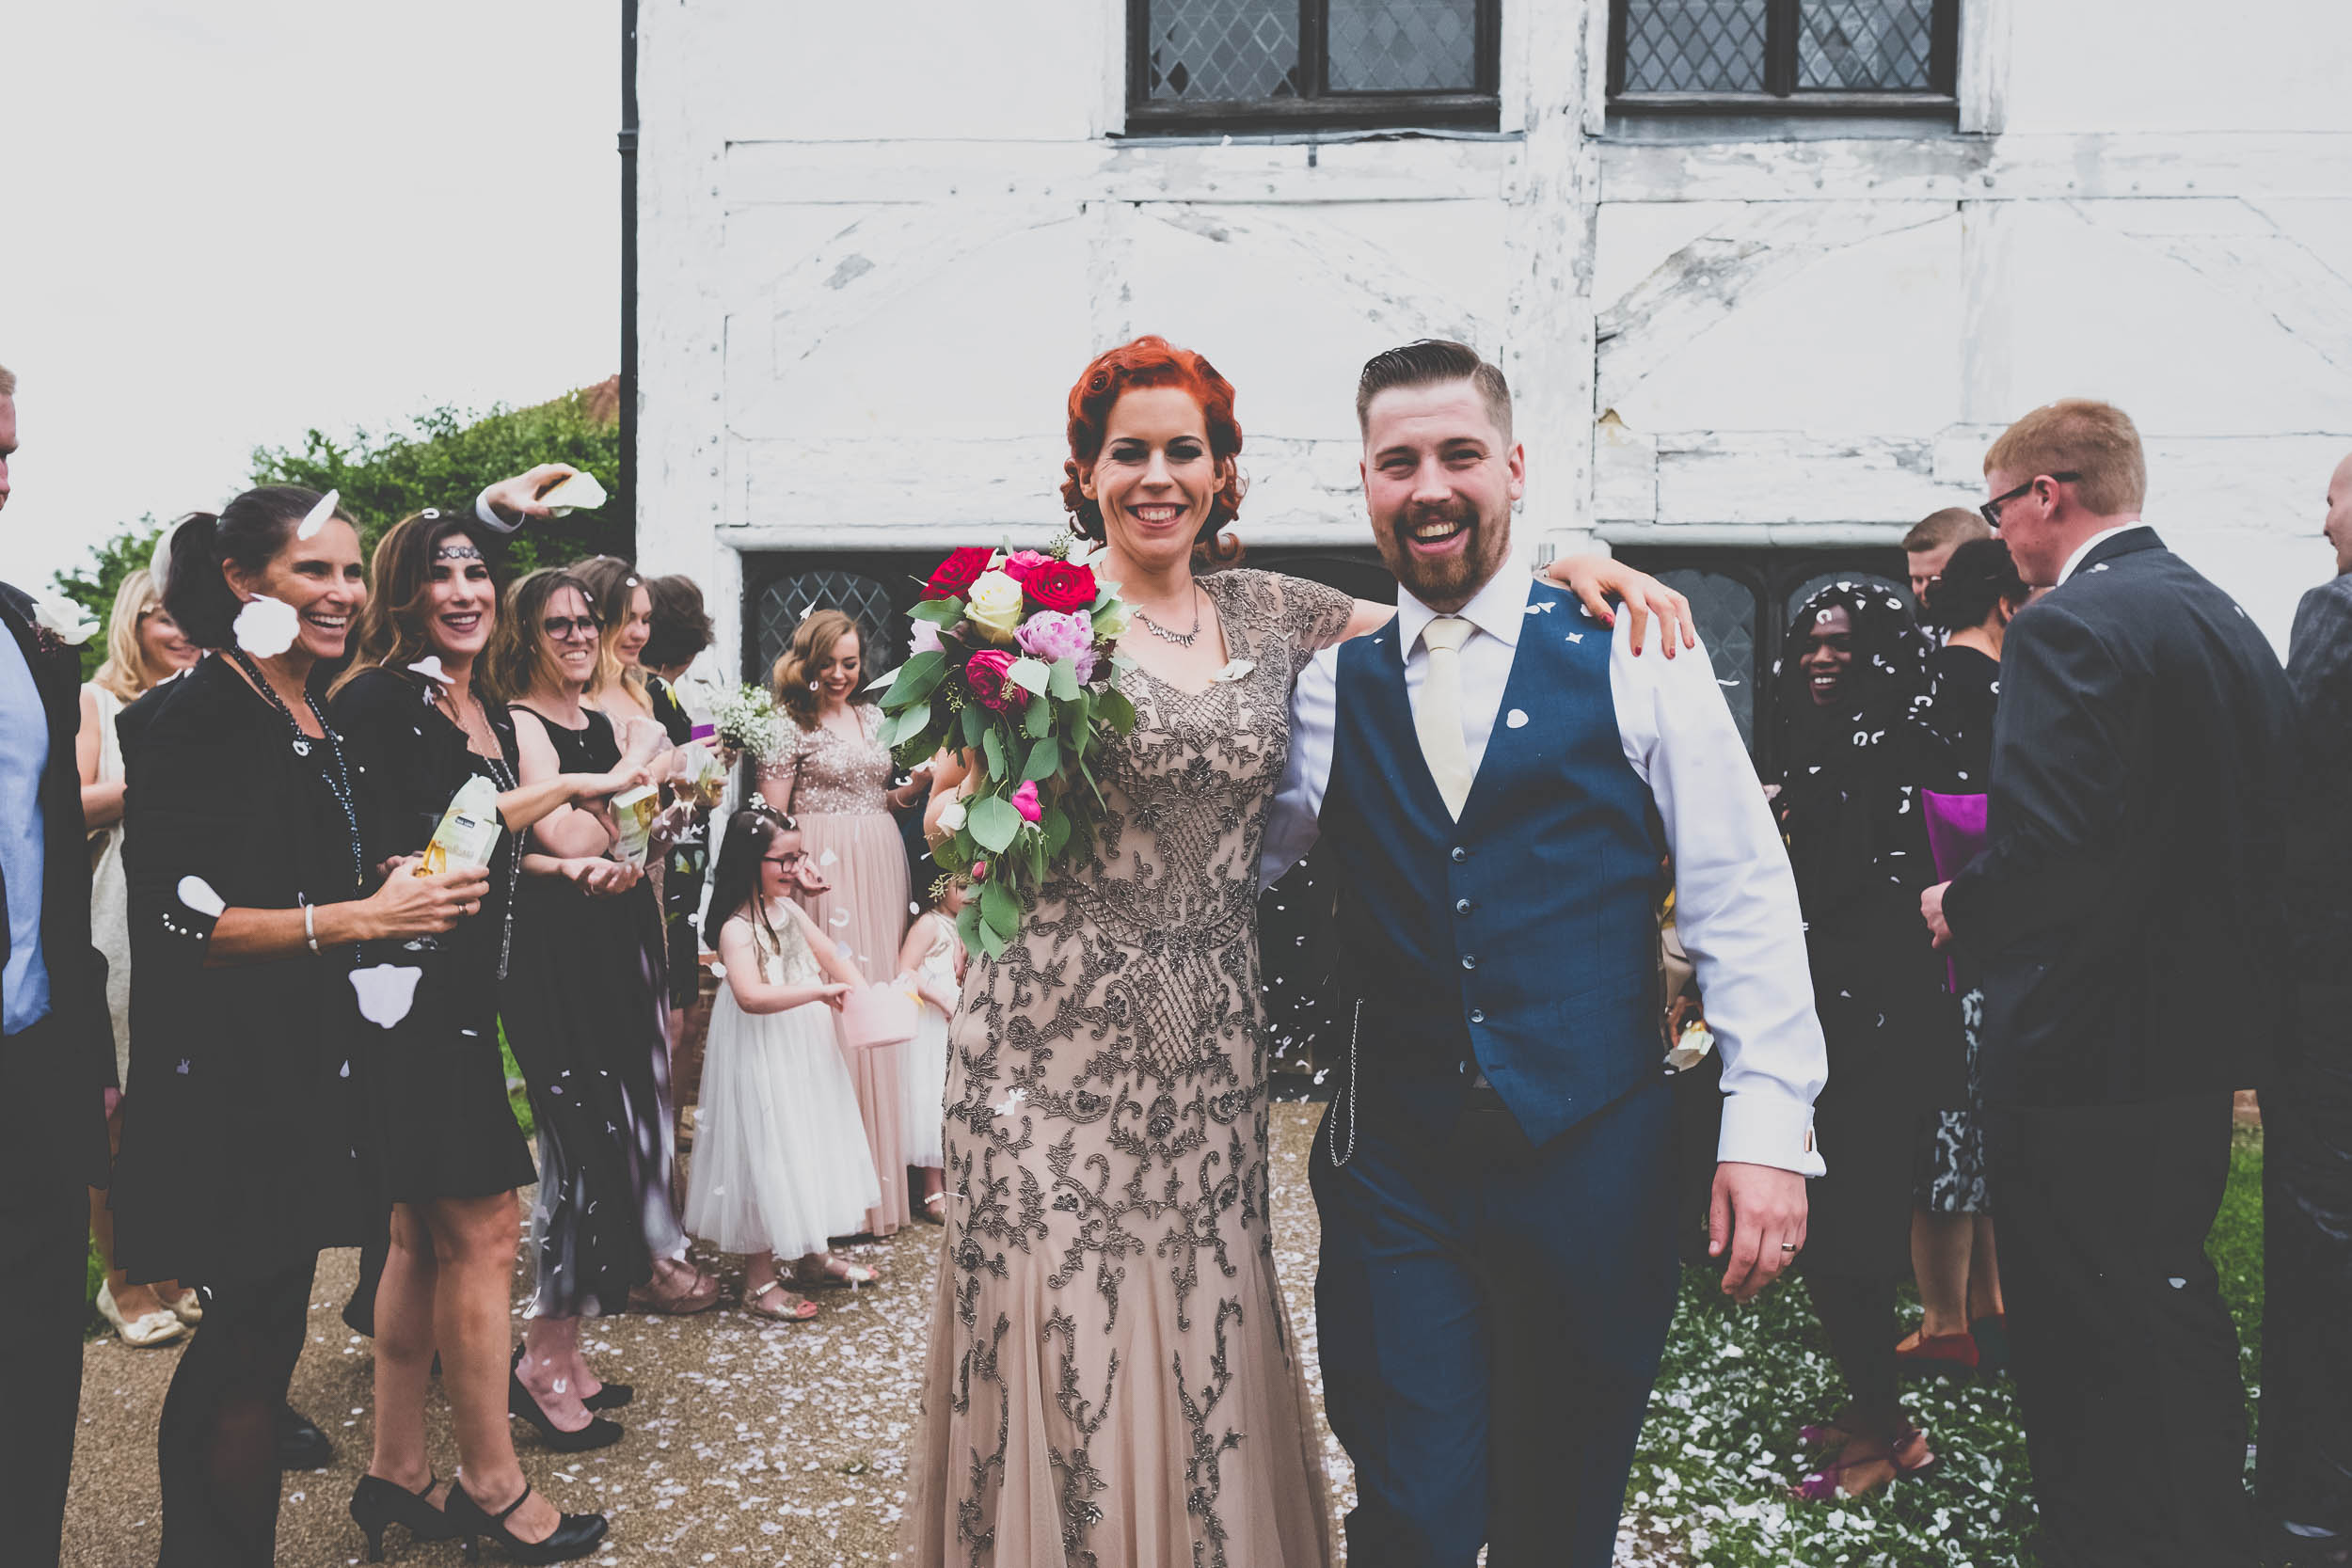 queen-elizabeths-hunting-lodge-epping-forest-wedding227.jpg